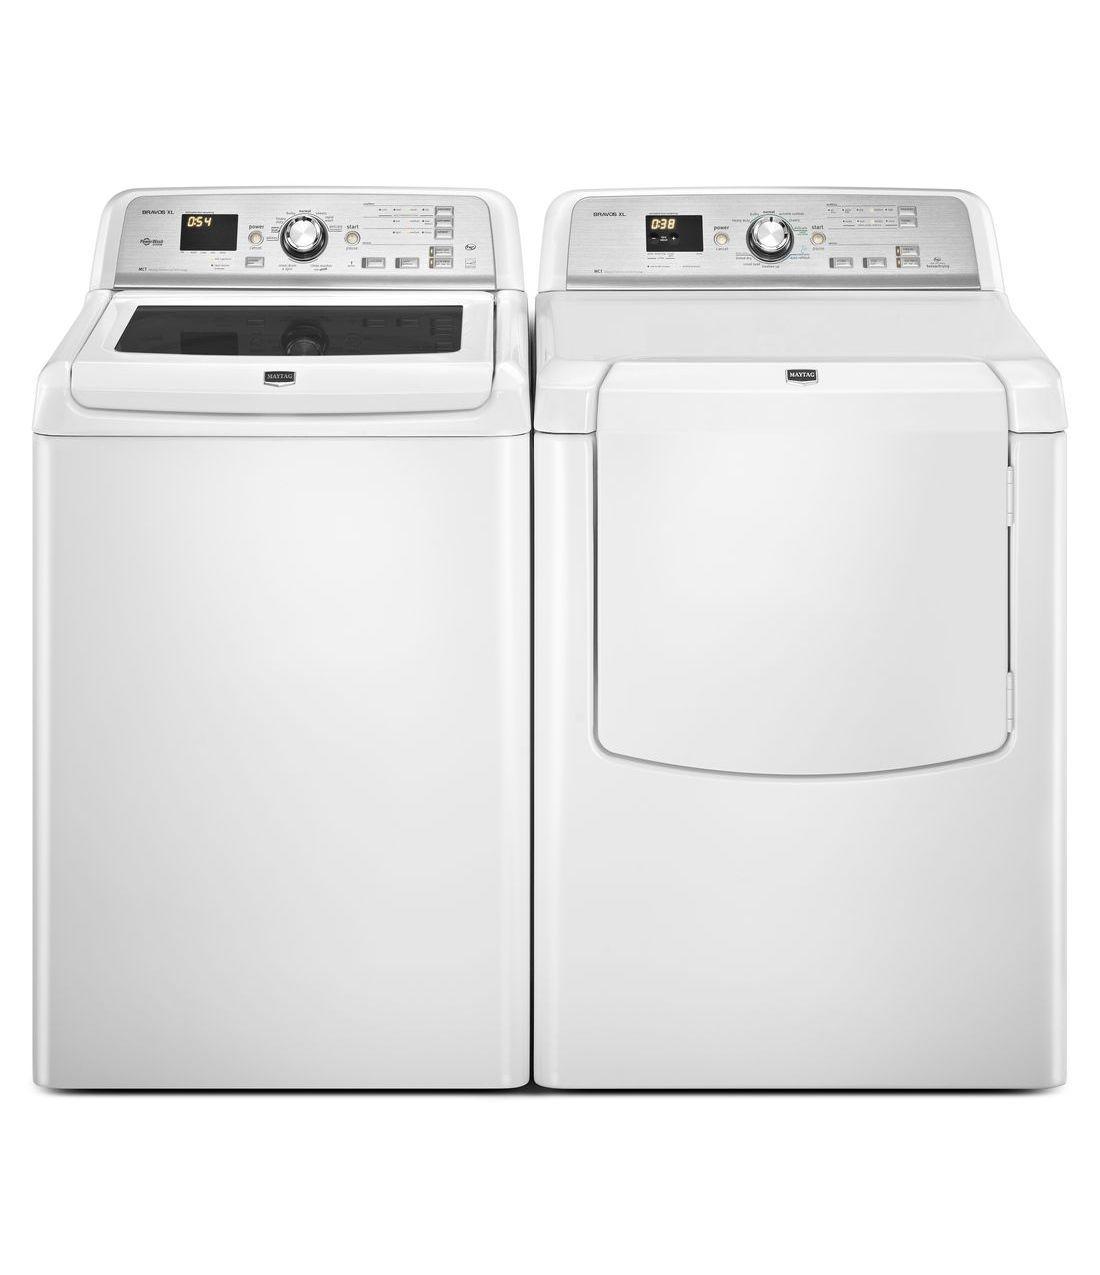 Mgdb725bw Maytag Mgdb725bw Bravos Xl Series Gas Dryers